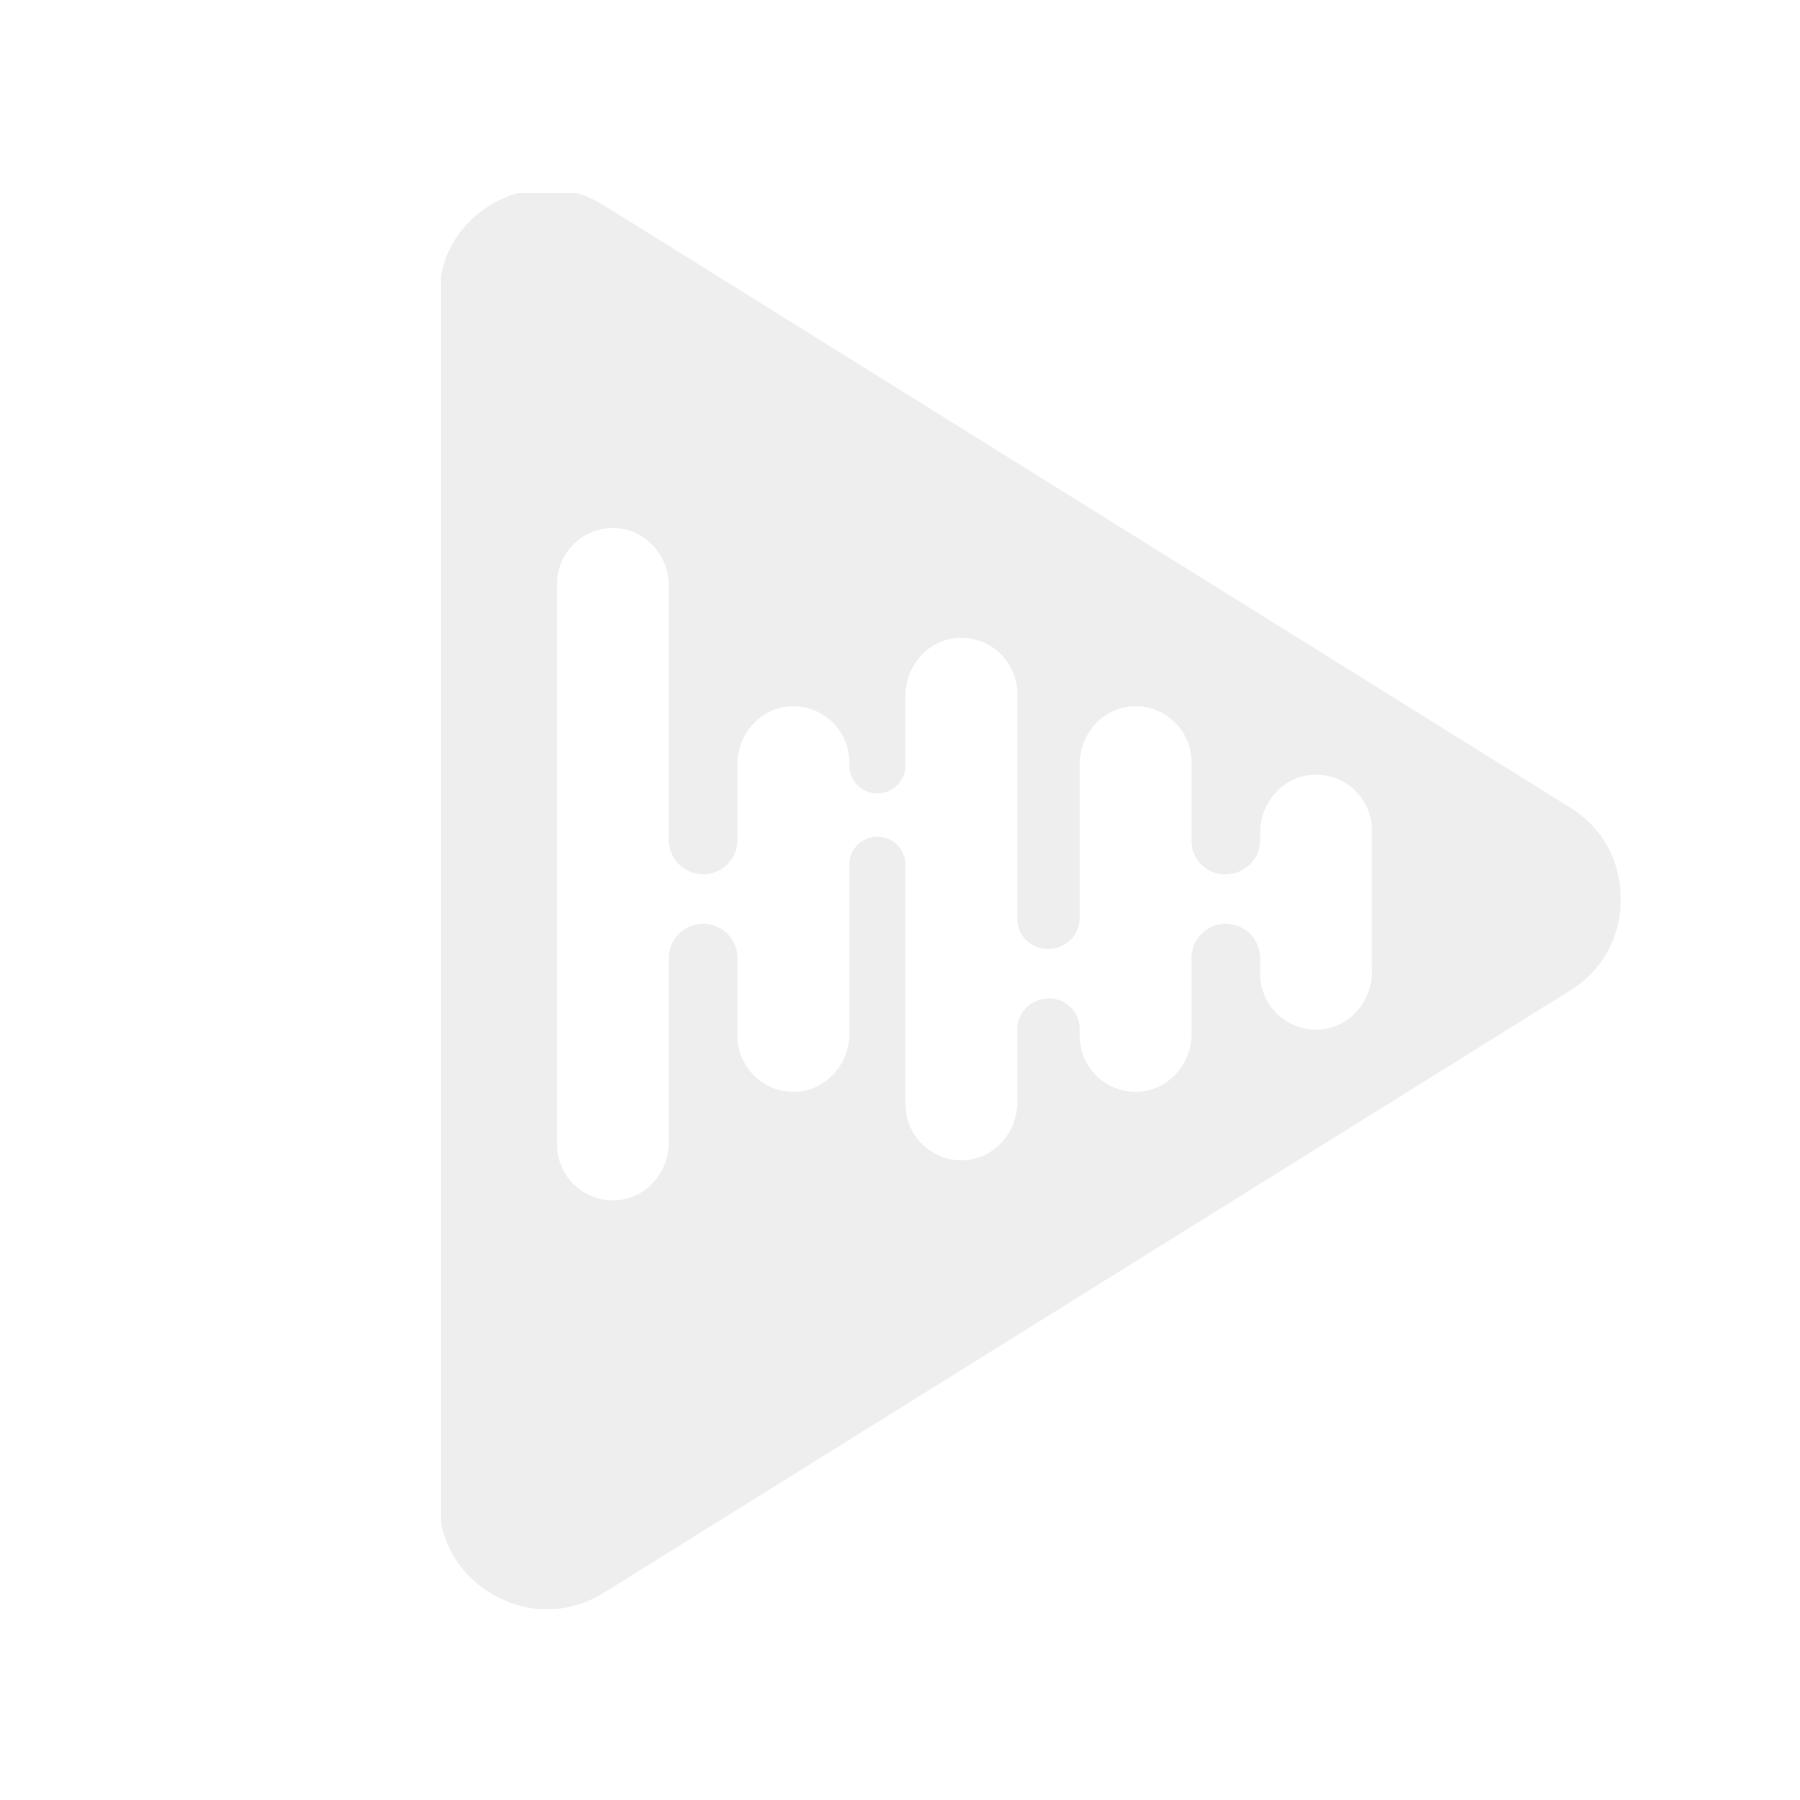 Kufatec Fistune 39531